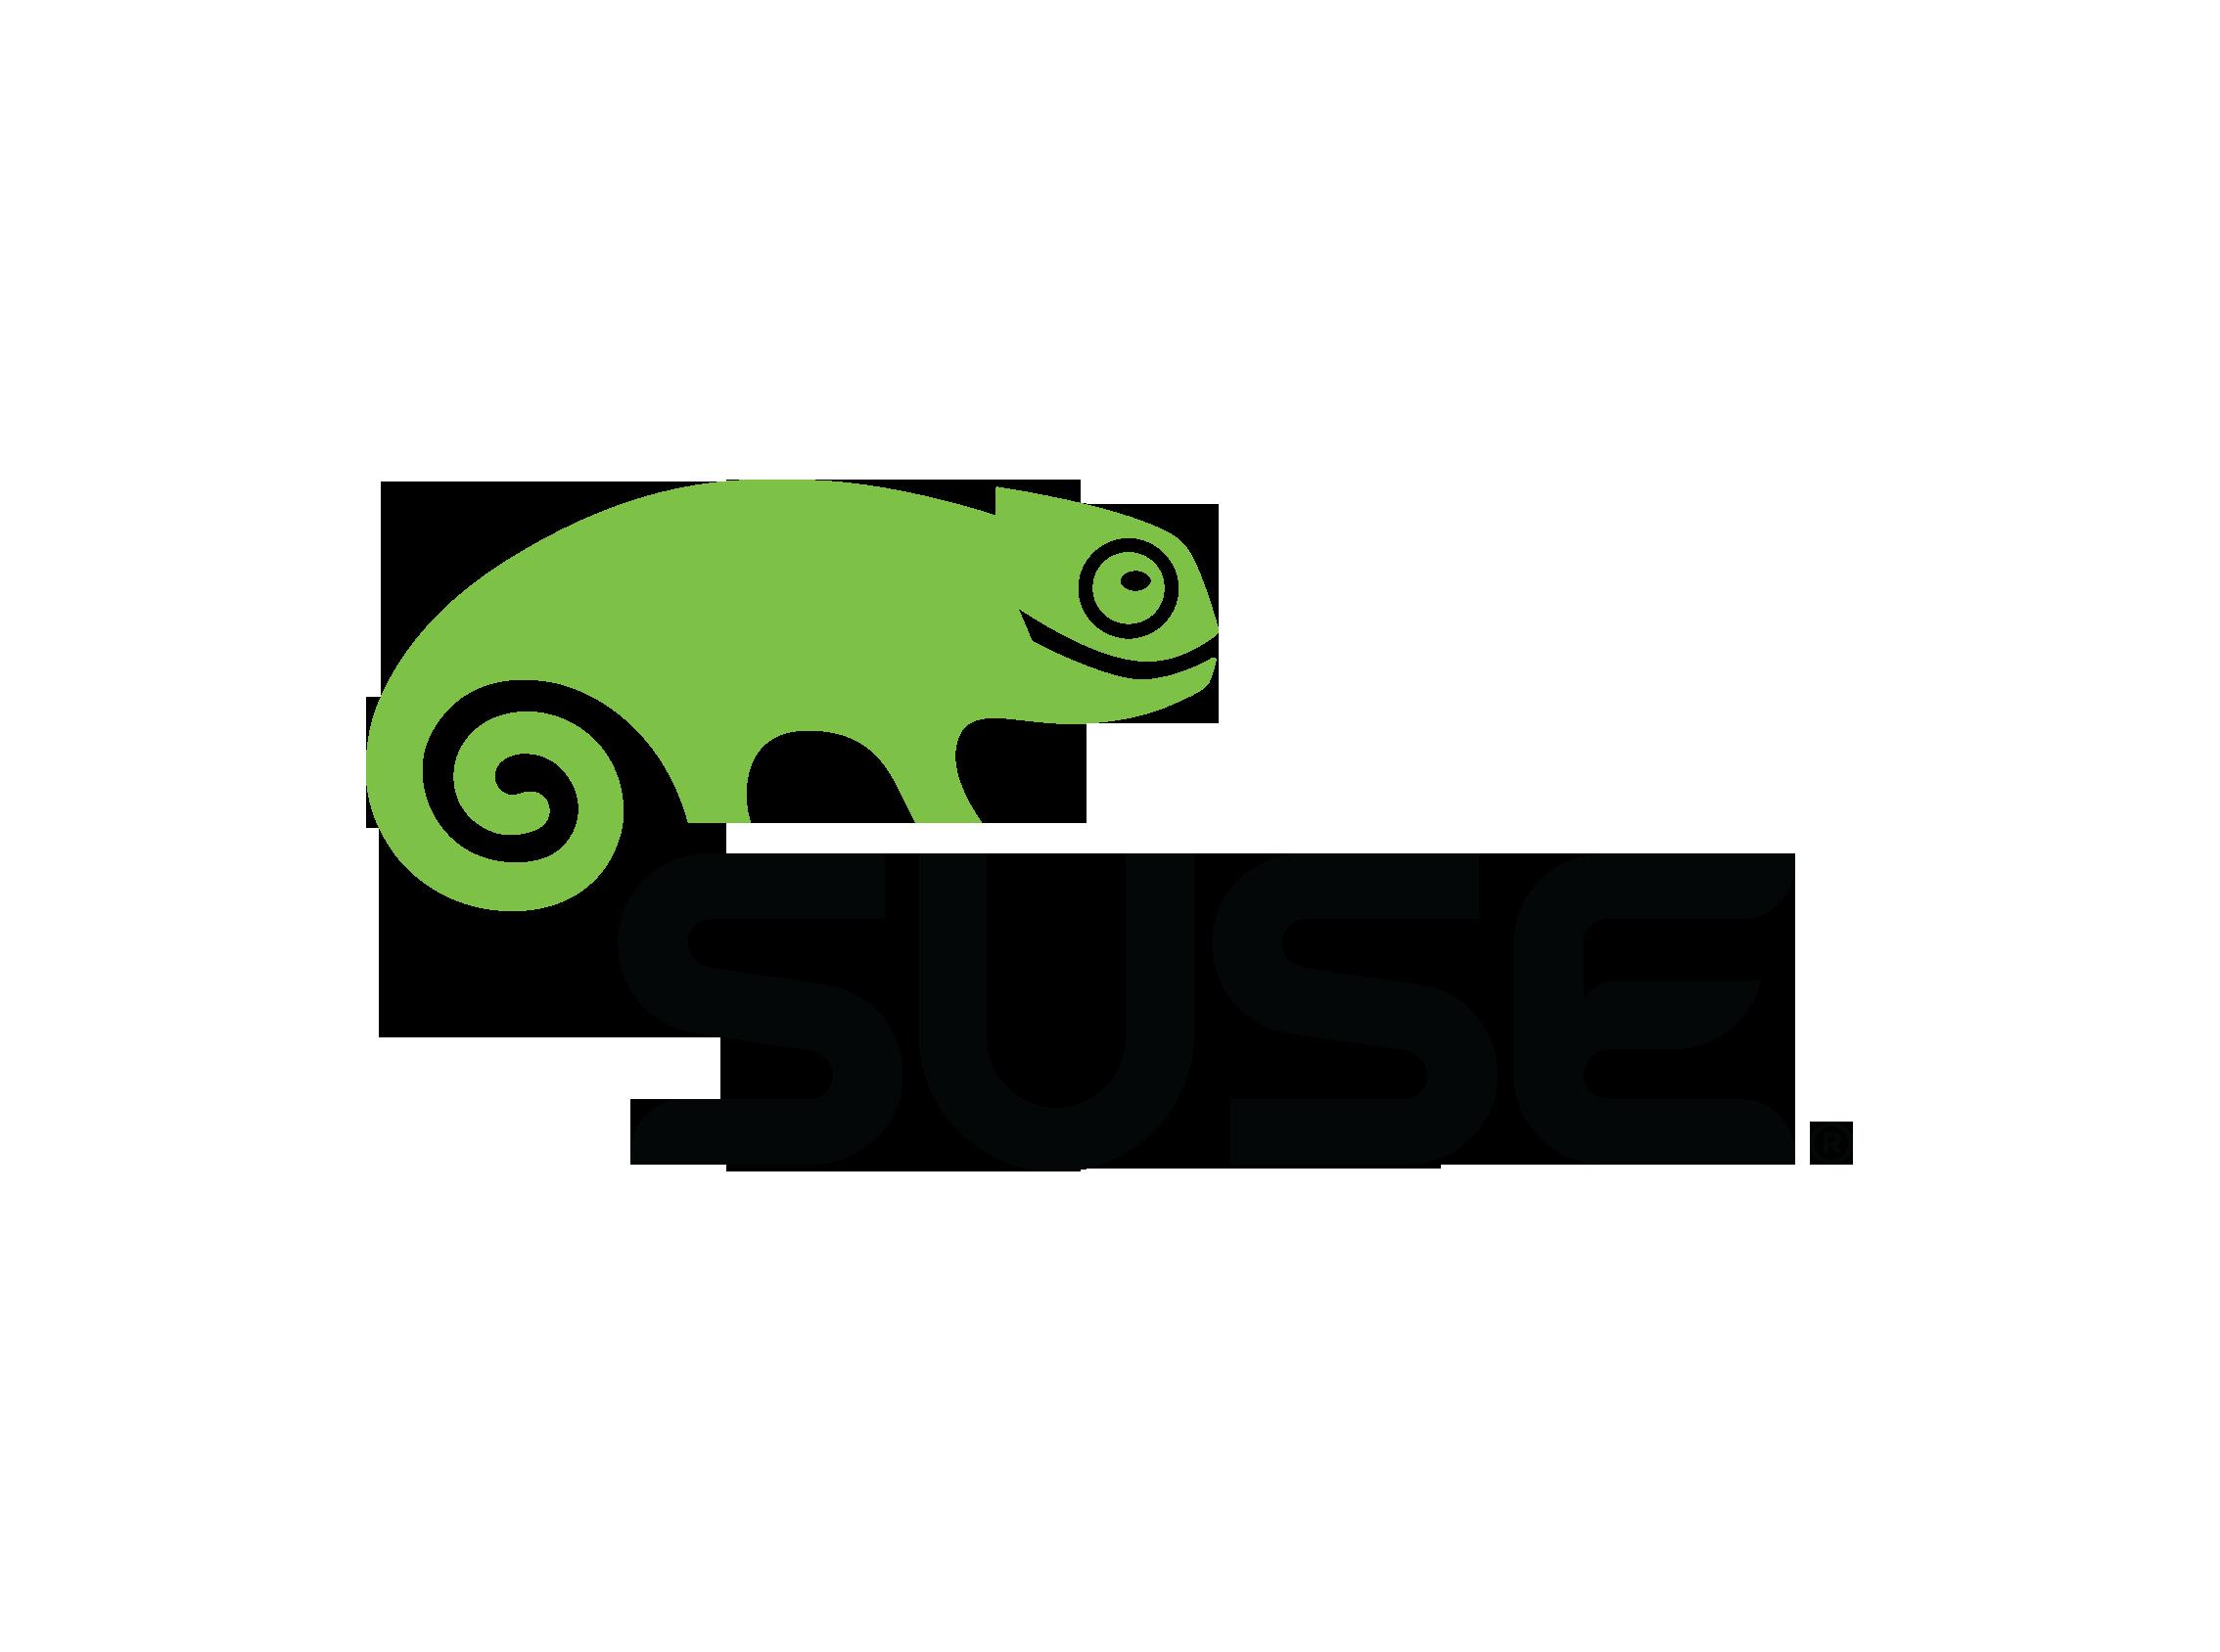 Suse-logo-wordmark